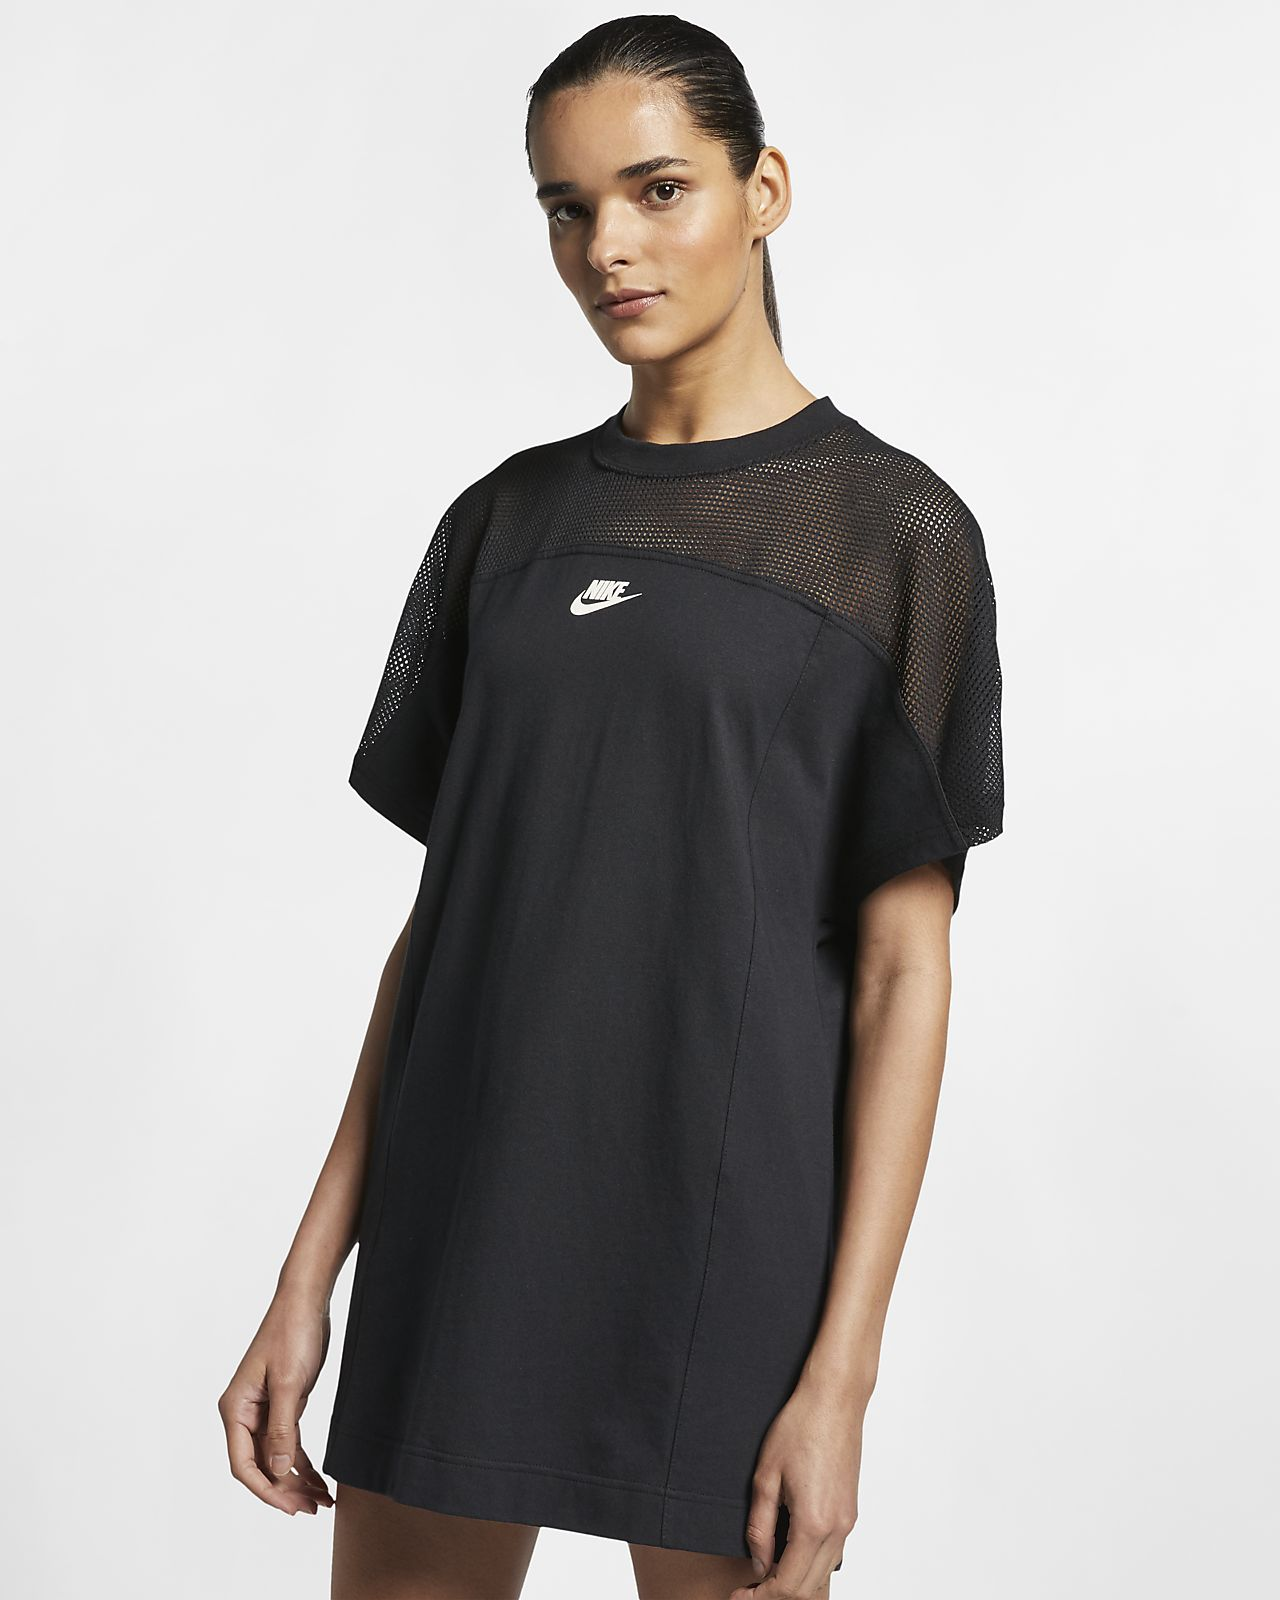 Abito in mesh Nike Sportswear - Donna